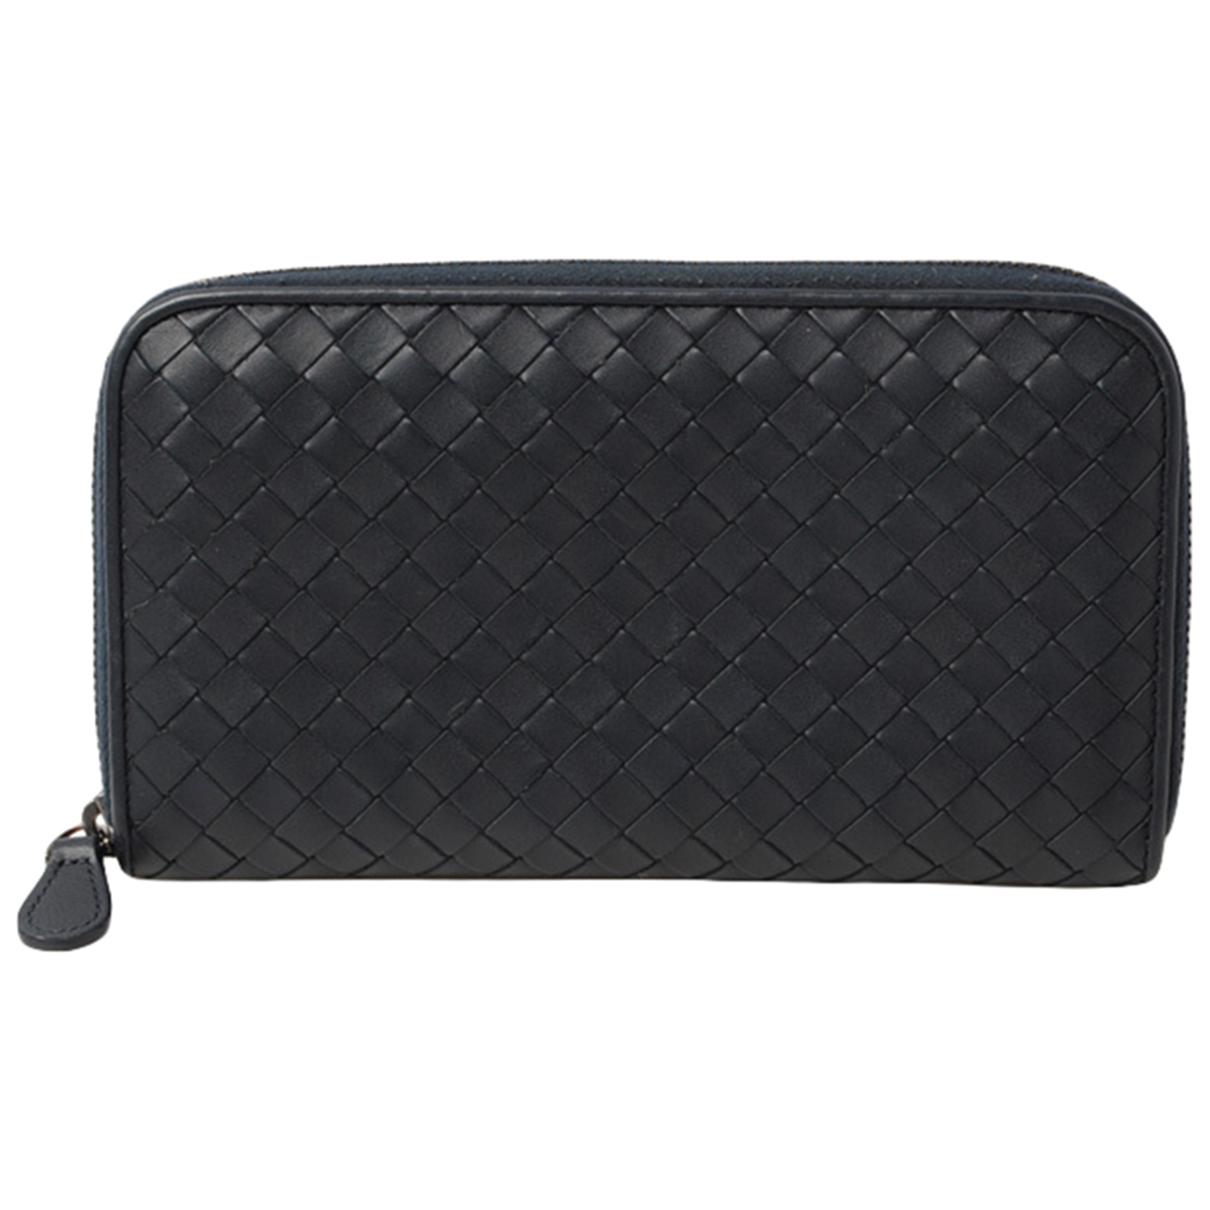 Bottega Veneta Intrecciato Navy Leather wallet for Women \N